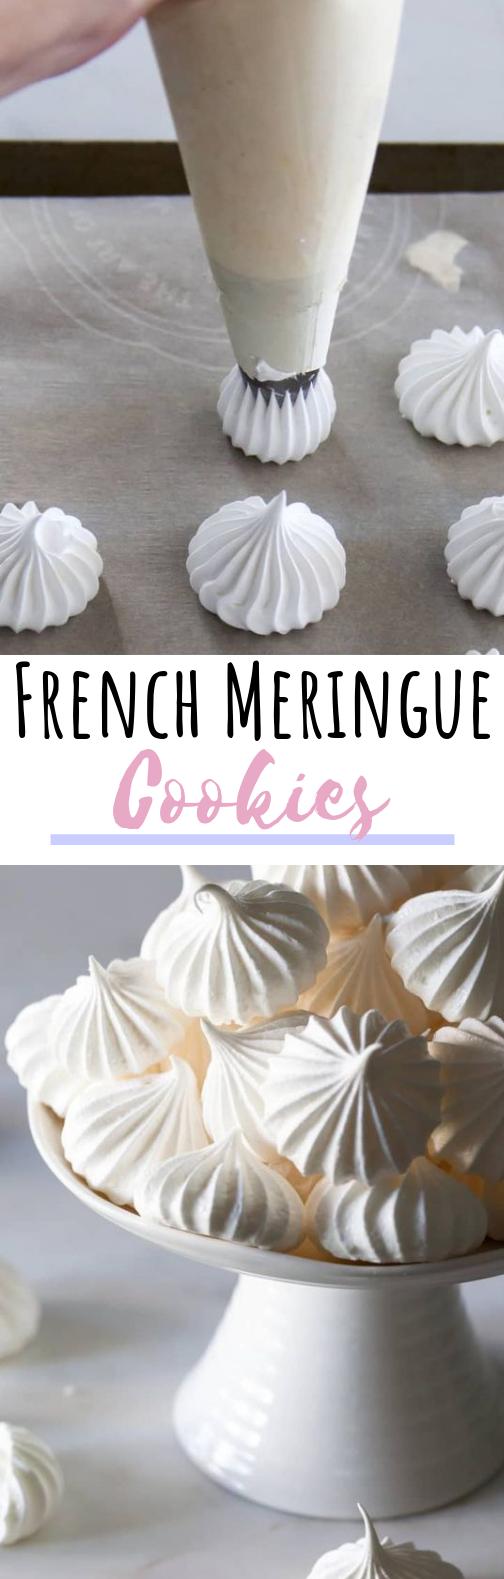 French Meringue #cookies #desserts